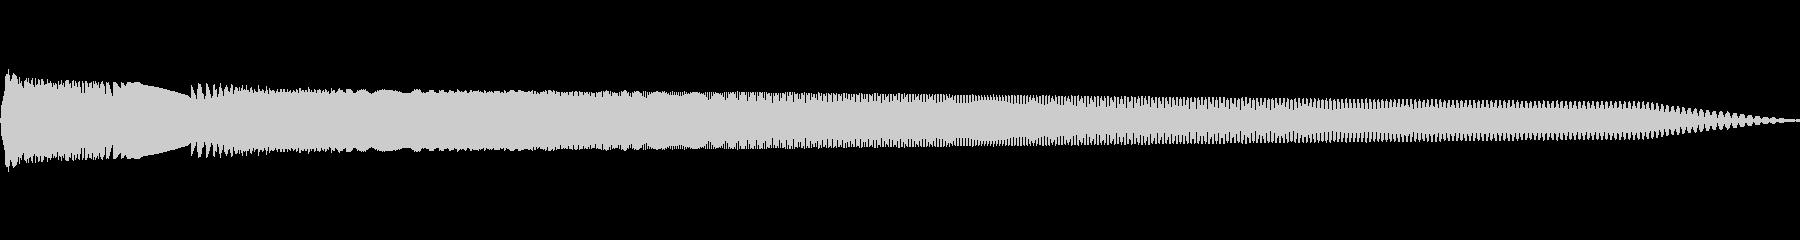 SciFi EC01_92_1の未再生の波形